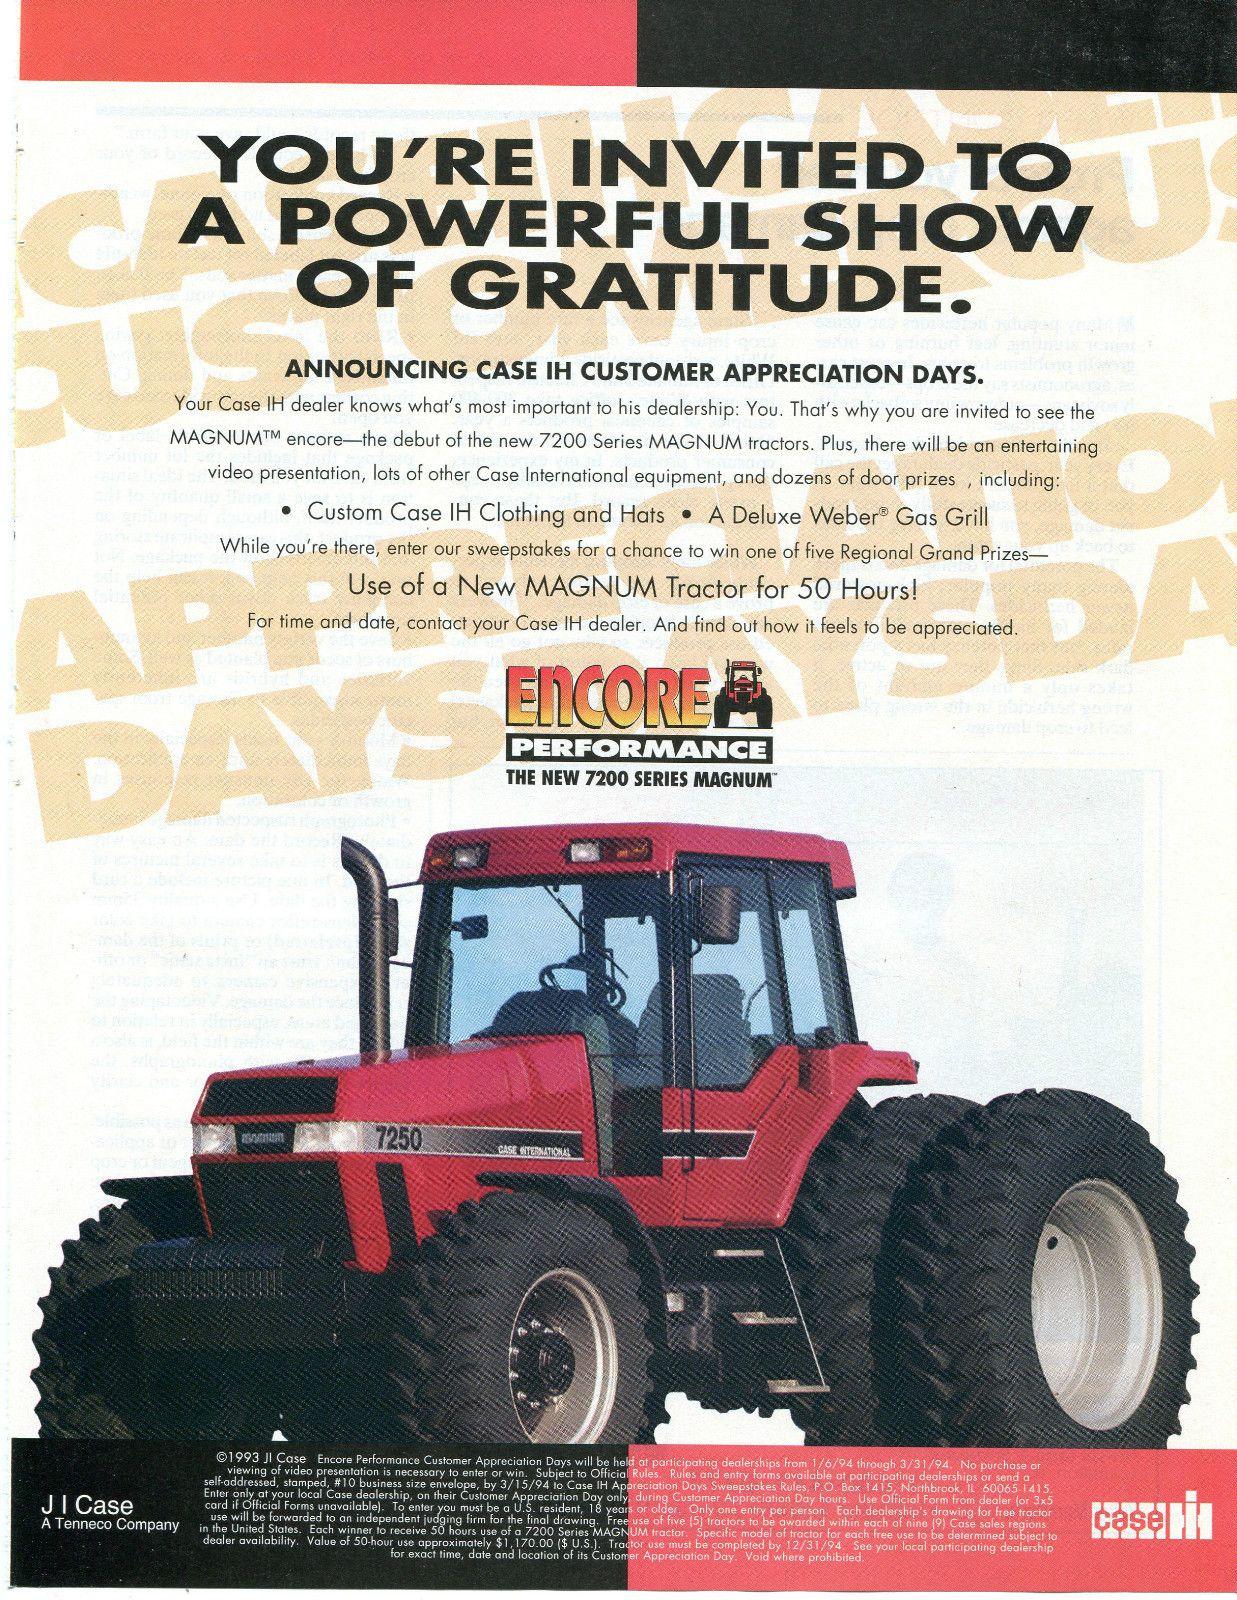 1994 Case International Harvester IH 7250 Magnum Tractor Magazine Ad | eBay